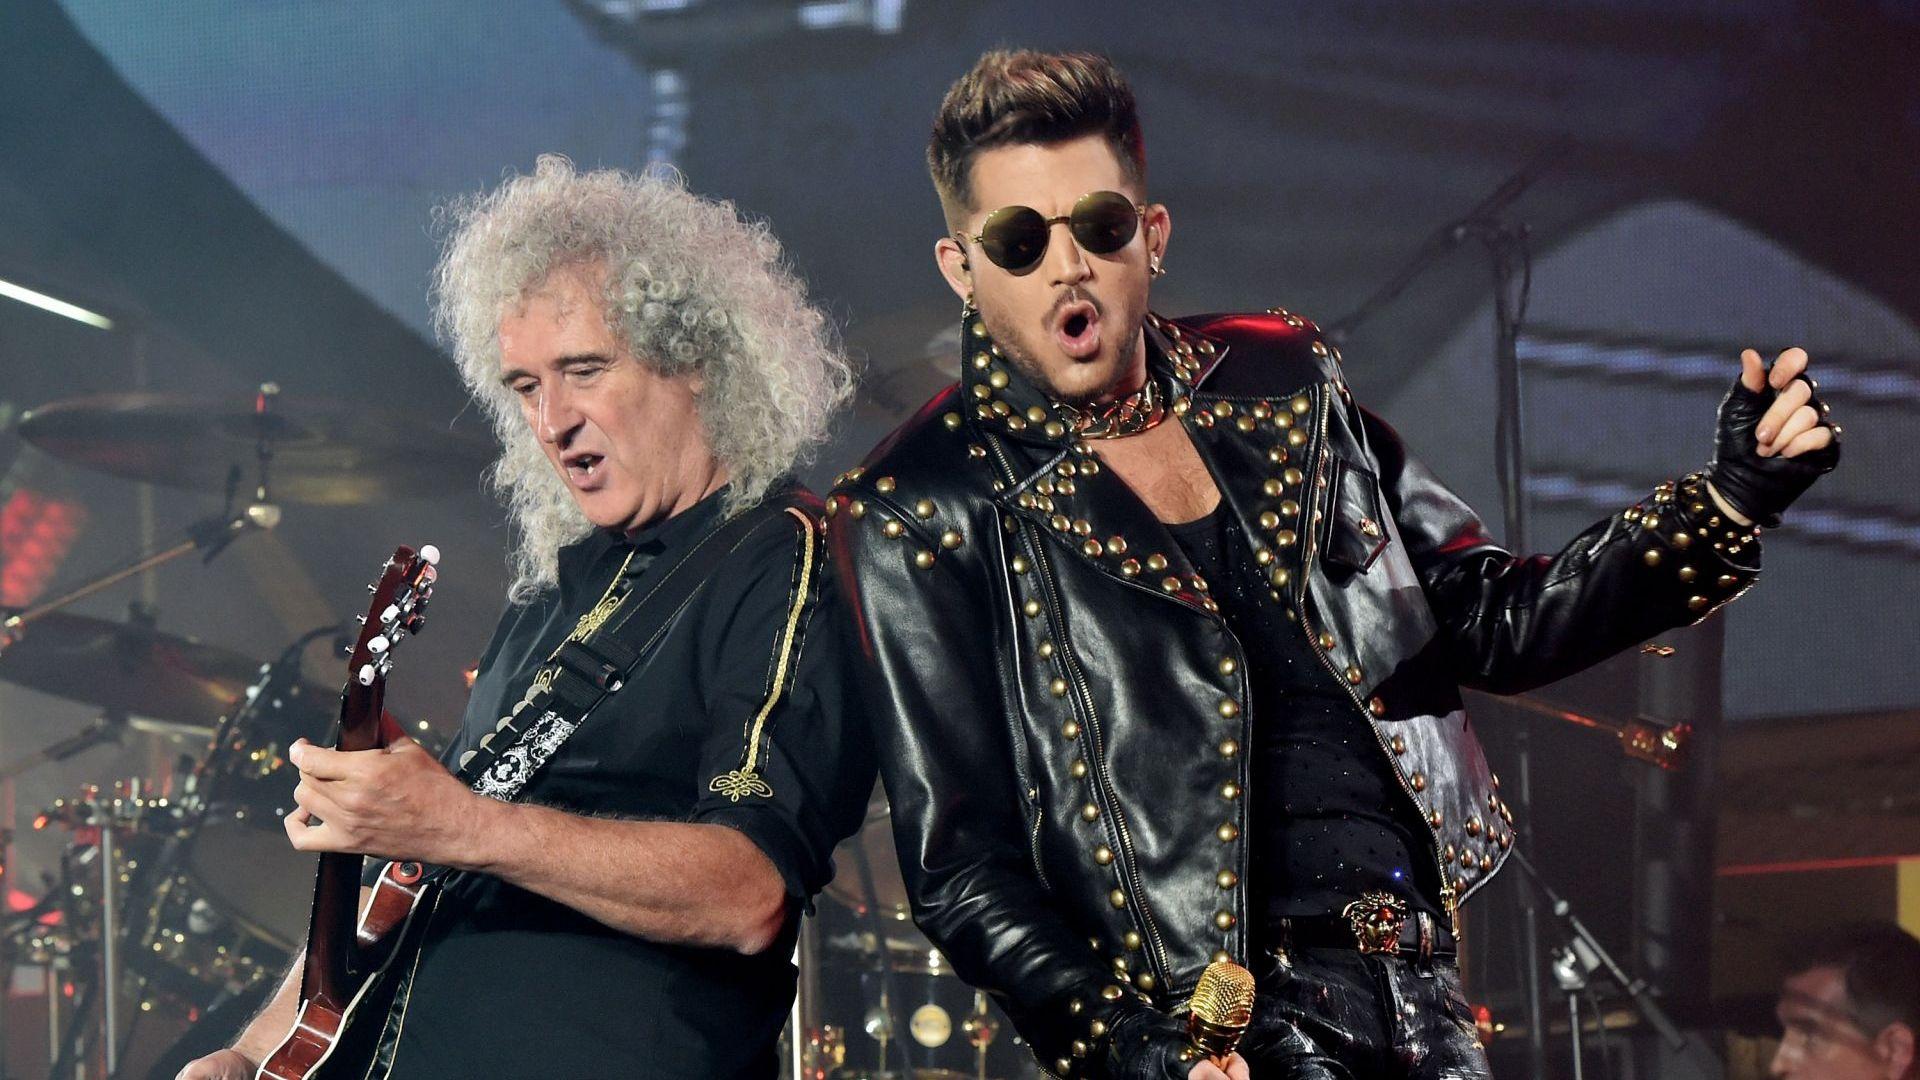 Queen и Адам Ламбърт издават концертен албум